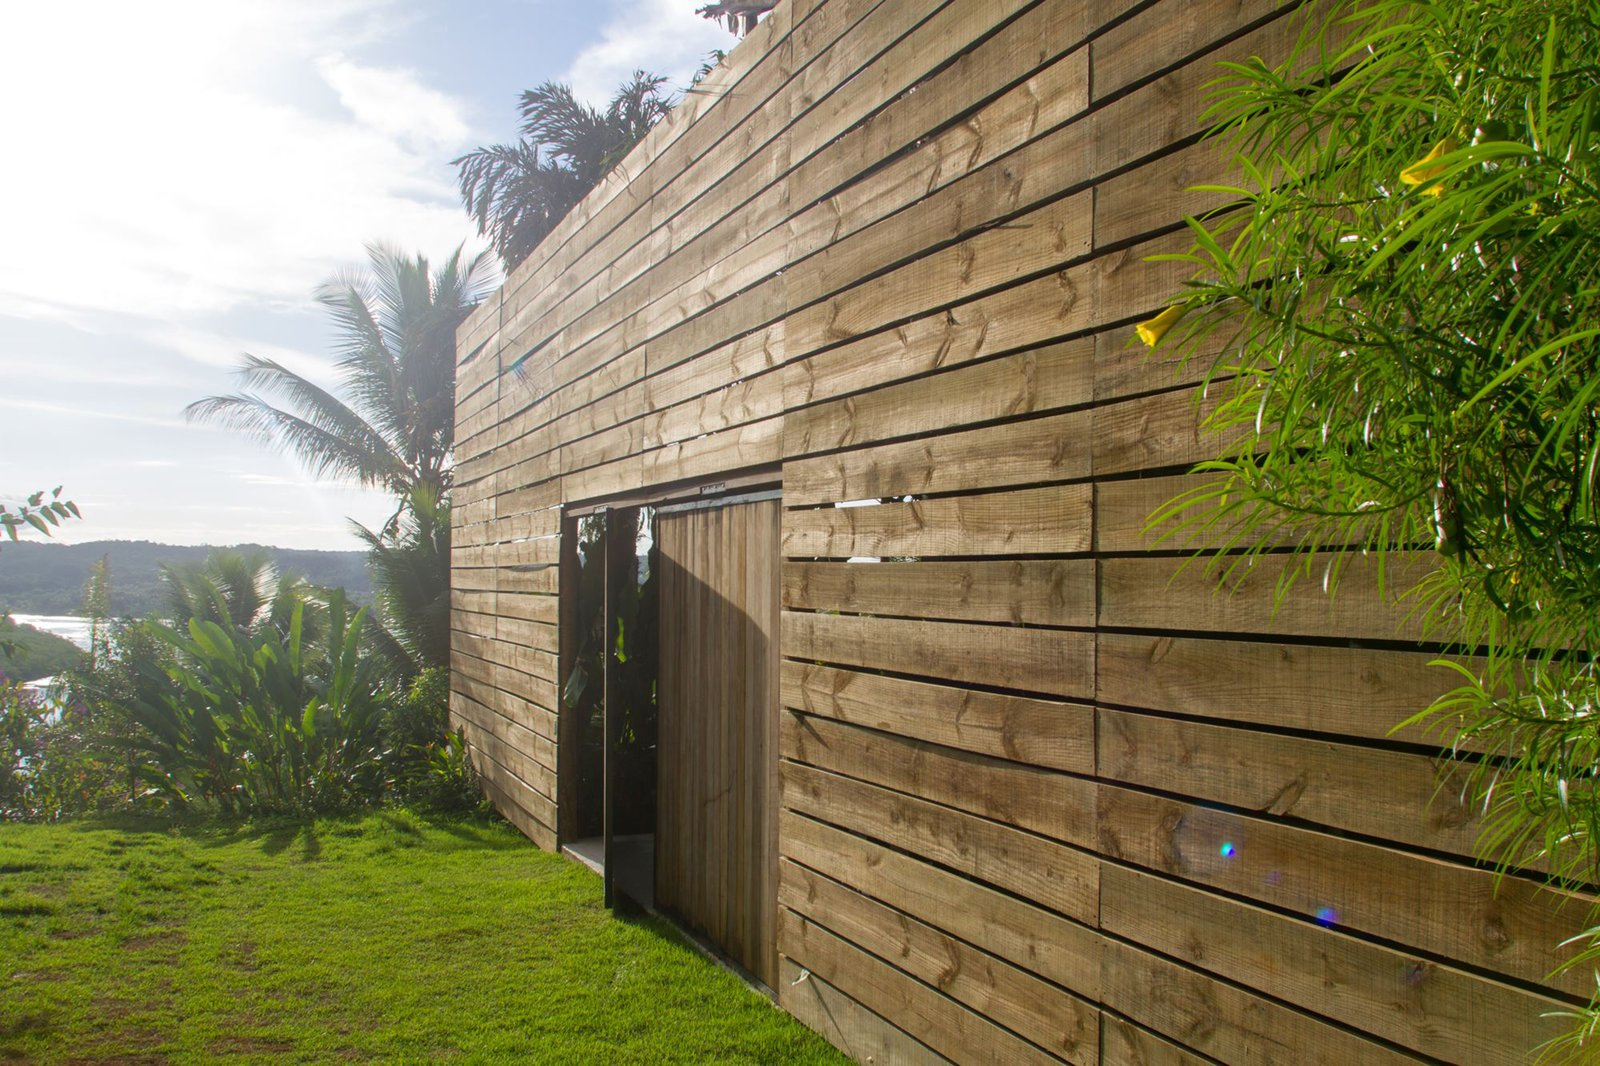 Wing House by Emanuelle R Araujo